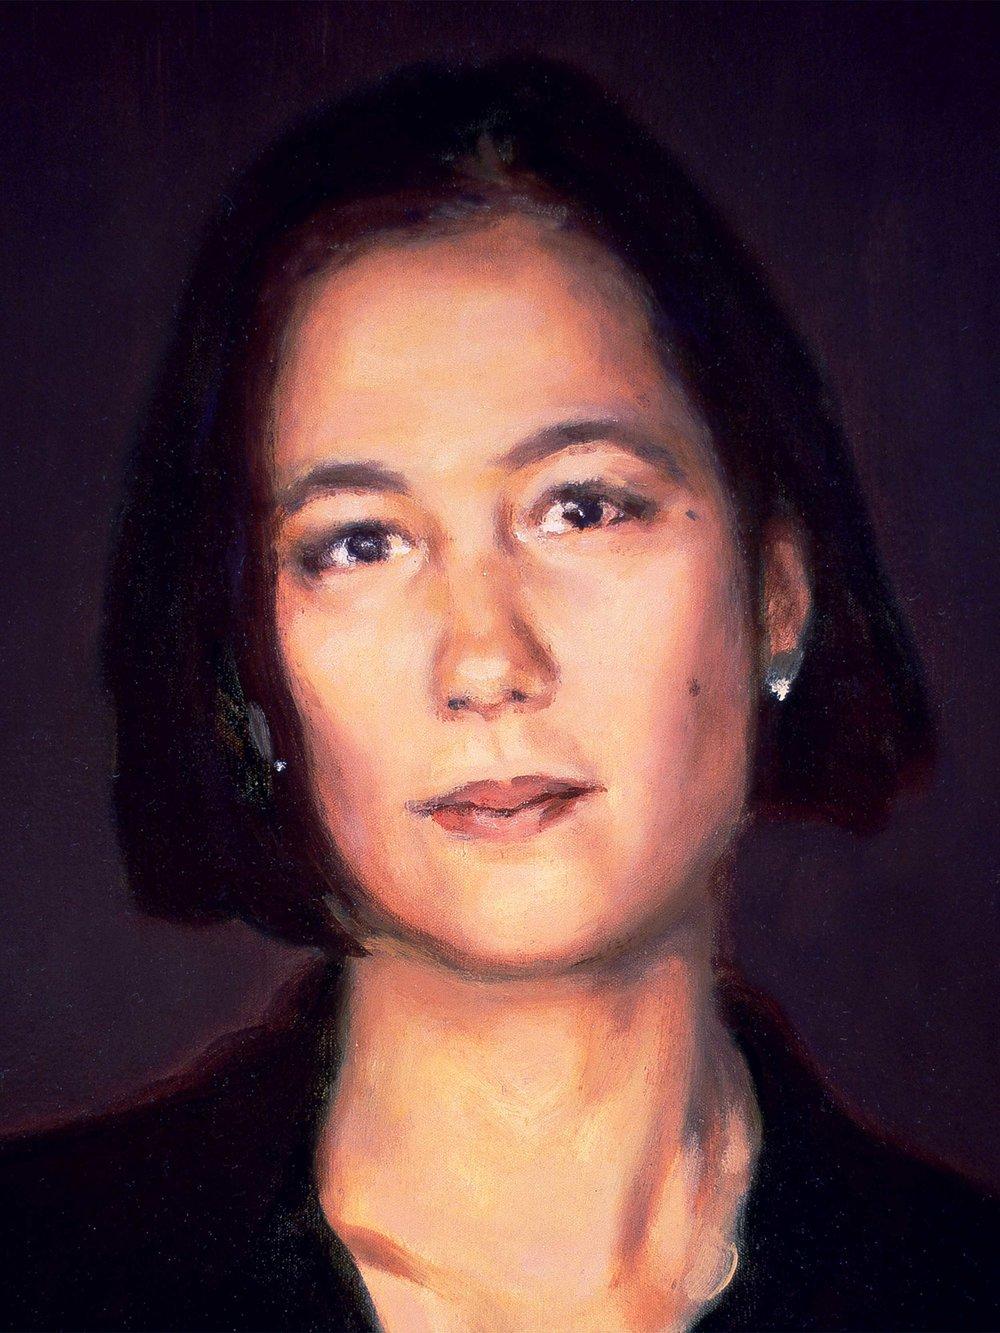 Jeanne Ryckmans (1997)